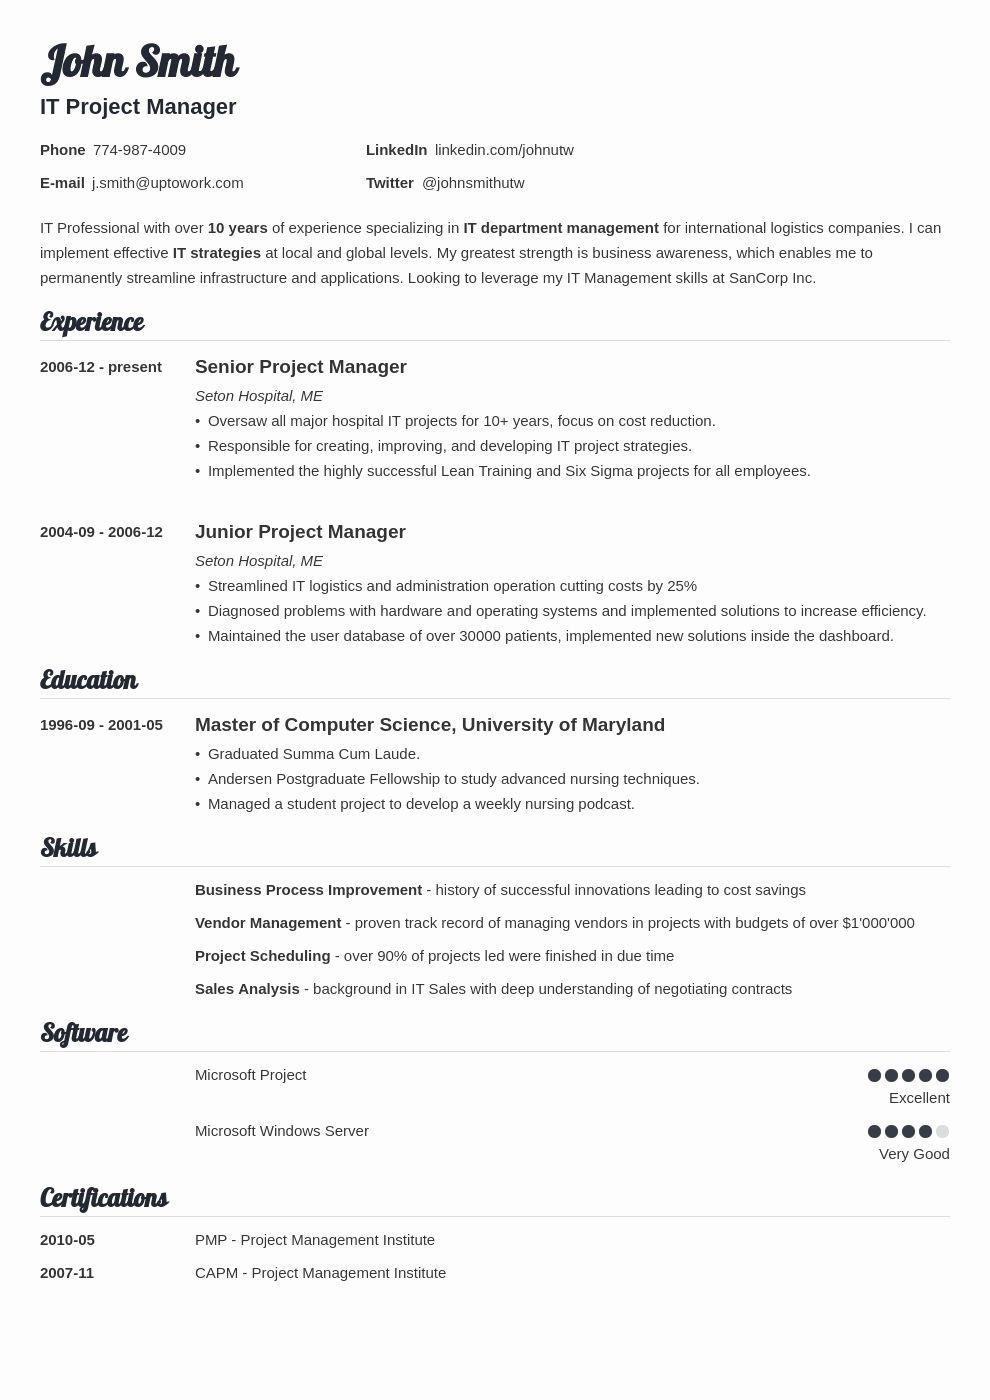 Minimalistic executive resume Word design professional